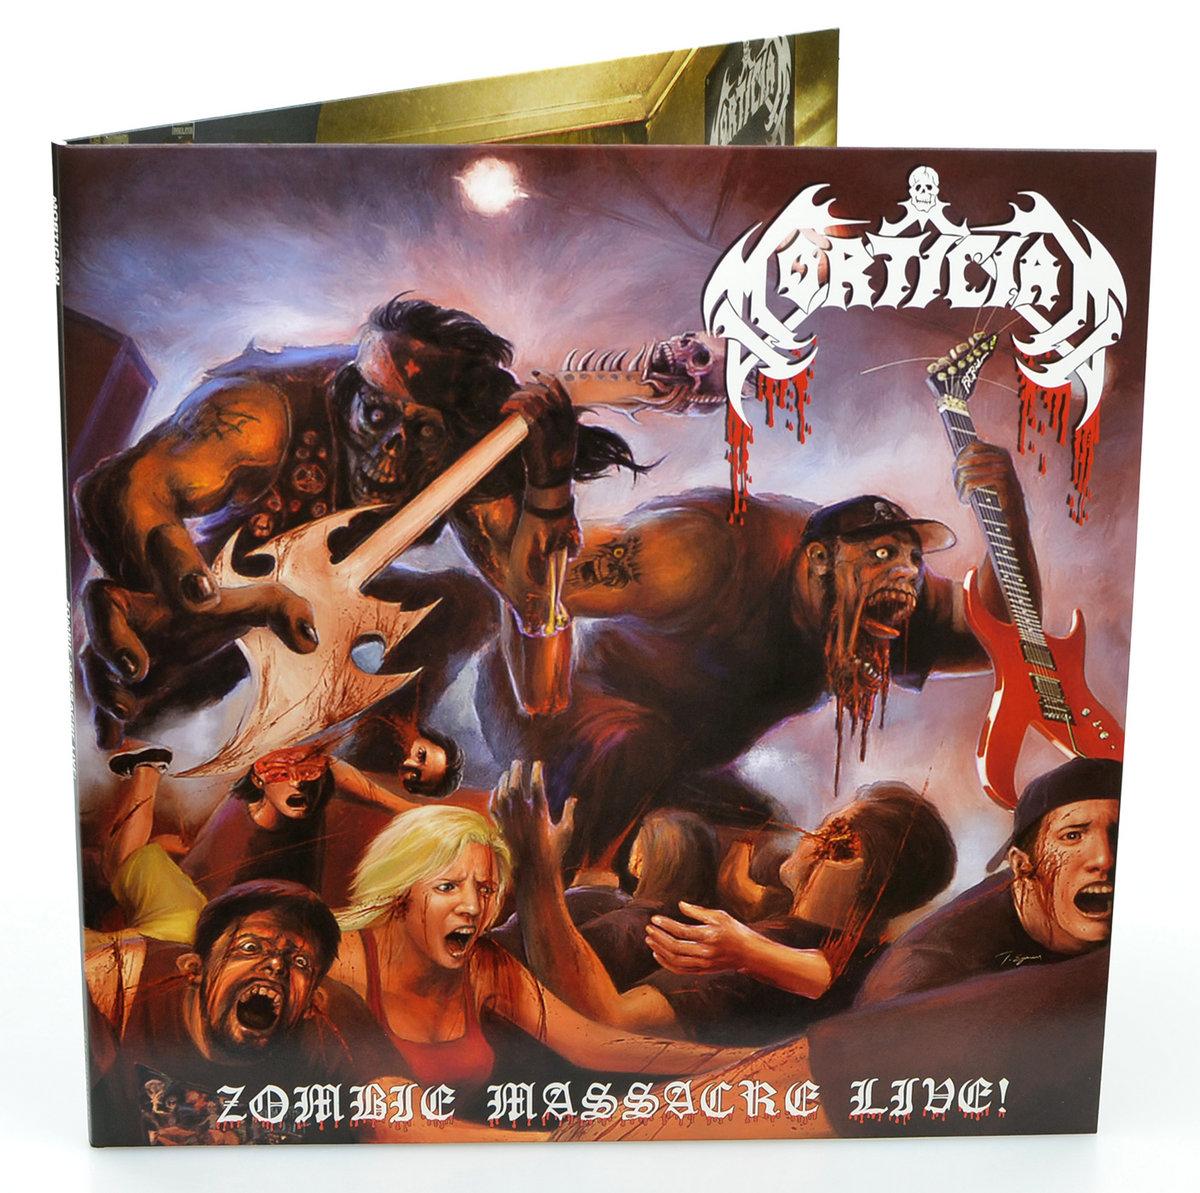 Zombie Massacre Live Mortician